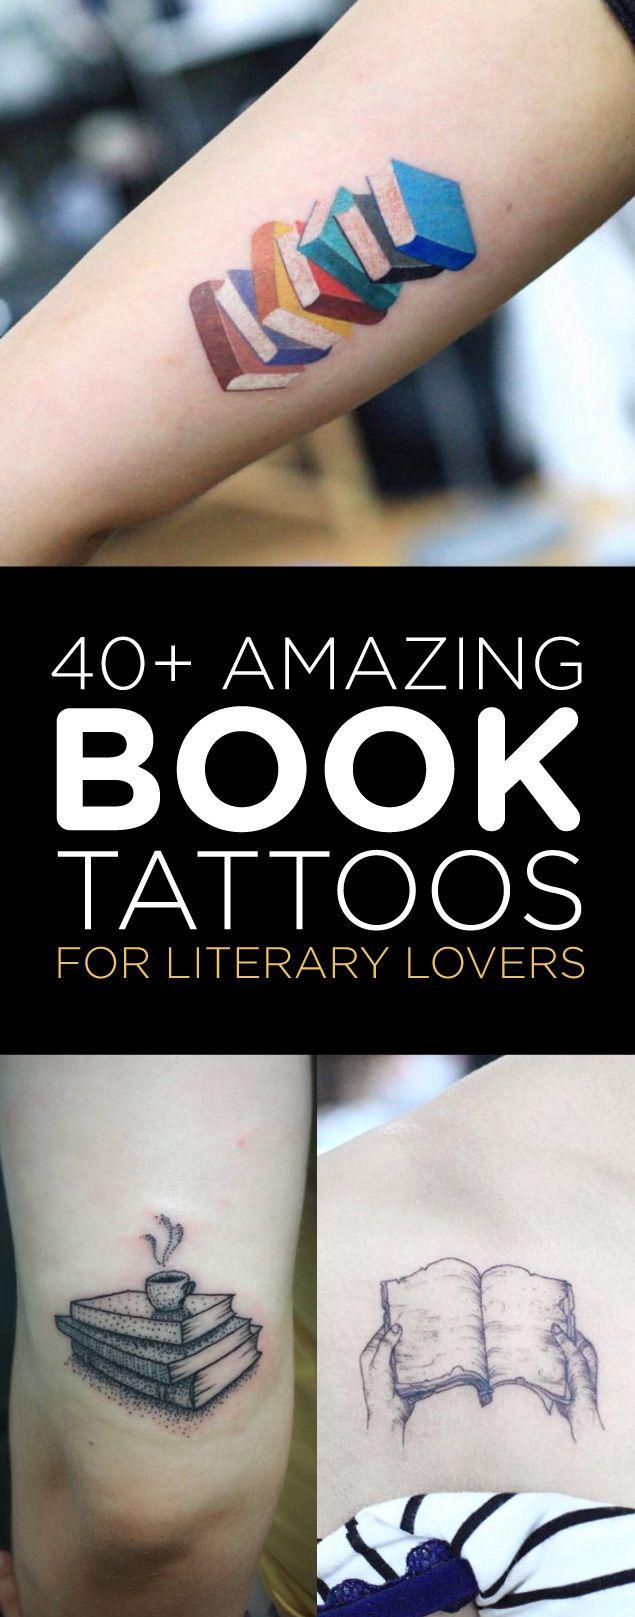 40+ Amazing Book Tattoo Designs | TattooBlend